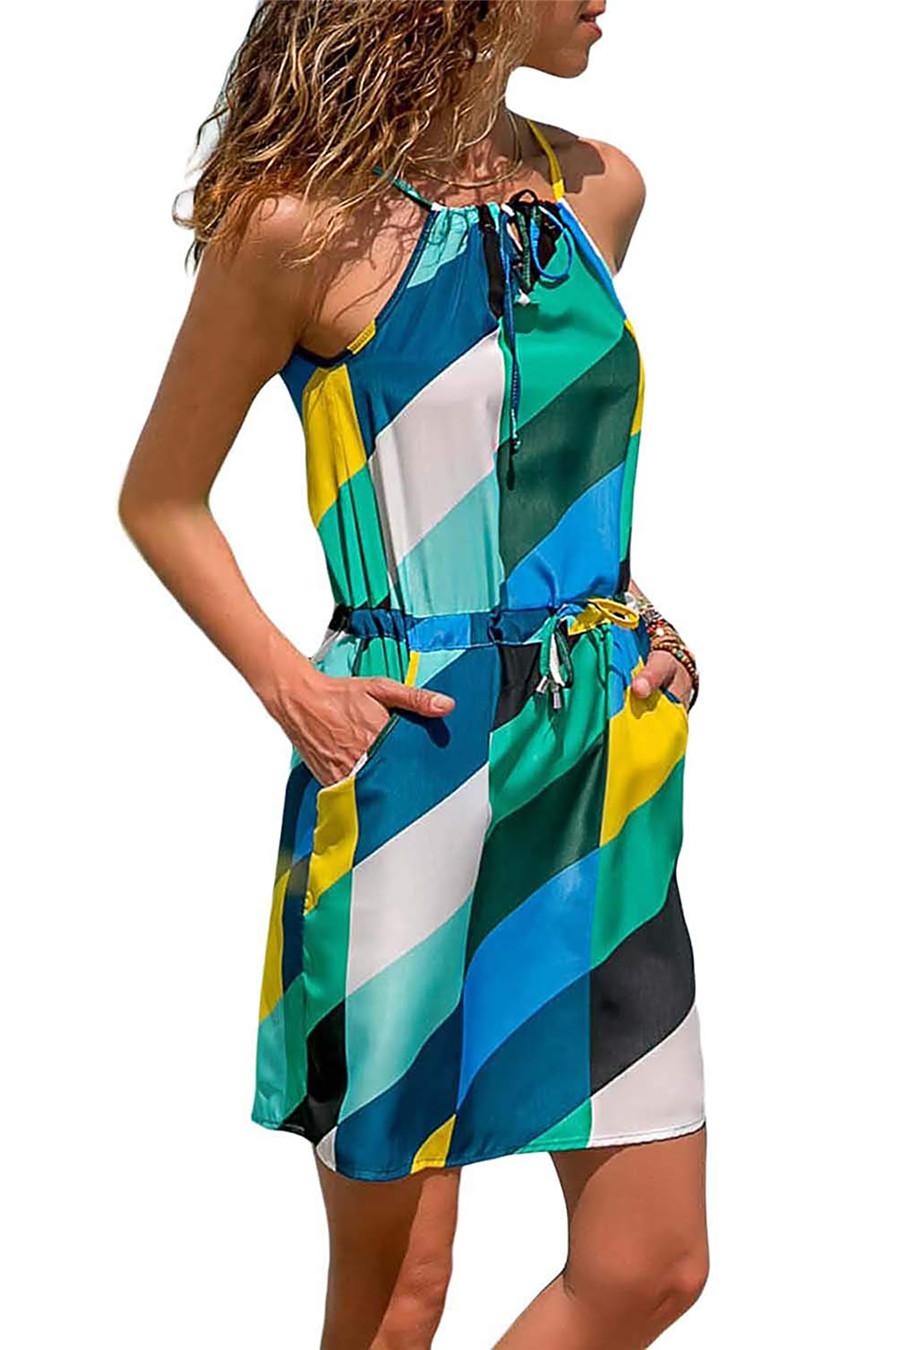 Gladiolus Chiffon Women Summer Dress Spaghetti Strap Floral Print Pocket Sexy Bohemian Beach Dress 2019 Short Ladies Dresses (33)